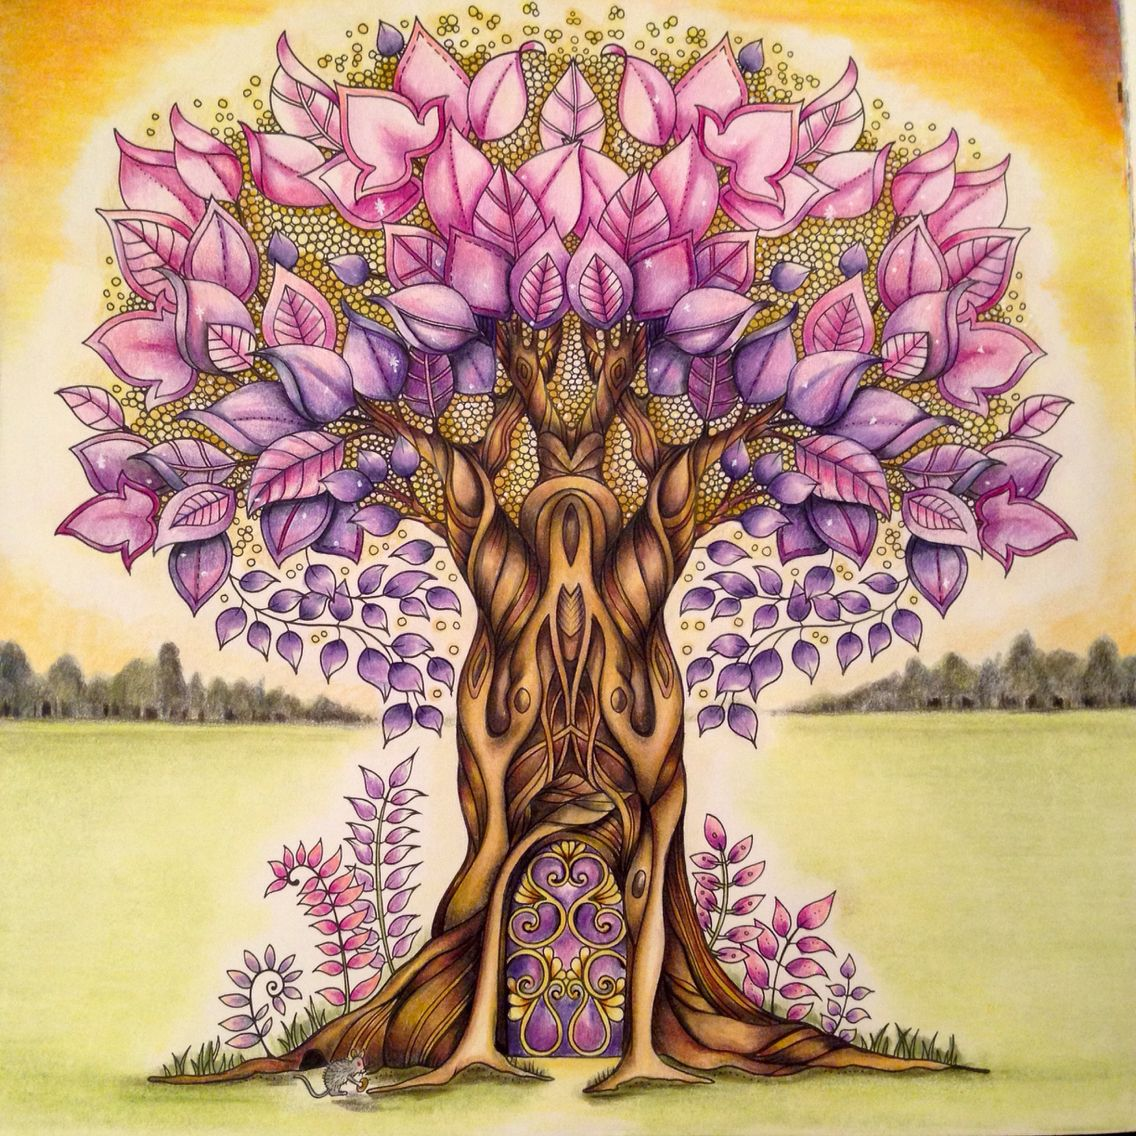 Enchanted Forest Johanna Basford. Used Polychromos Pencils Colouring Zenmalerei Malen